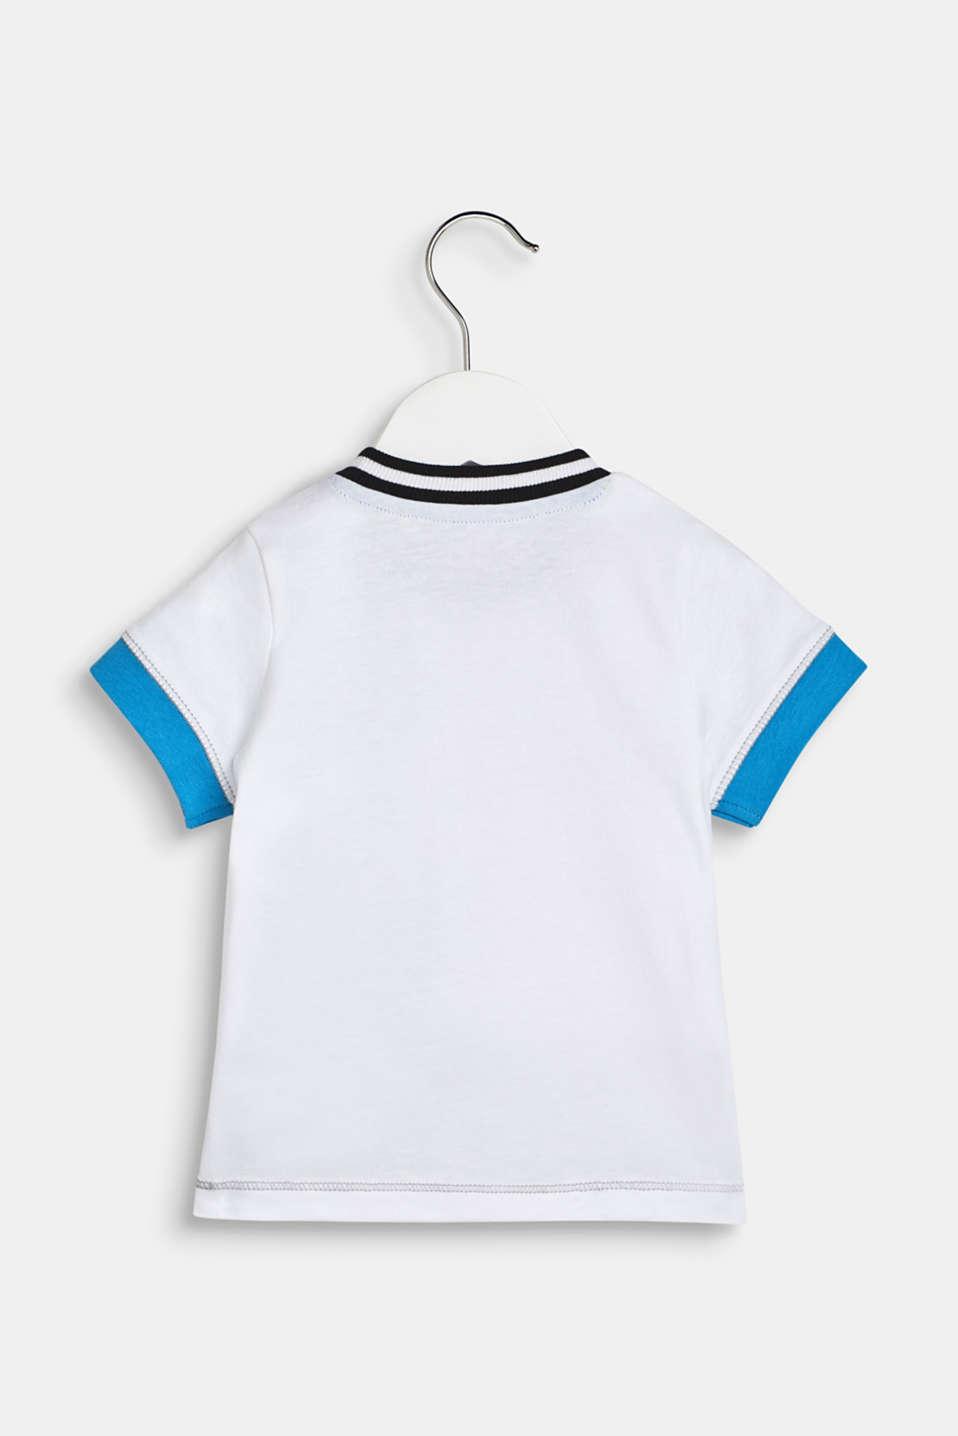 Statement print T-shirt, LCWHITE, detail image number 1